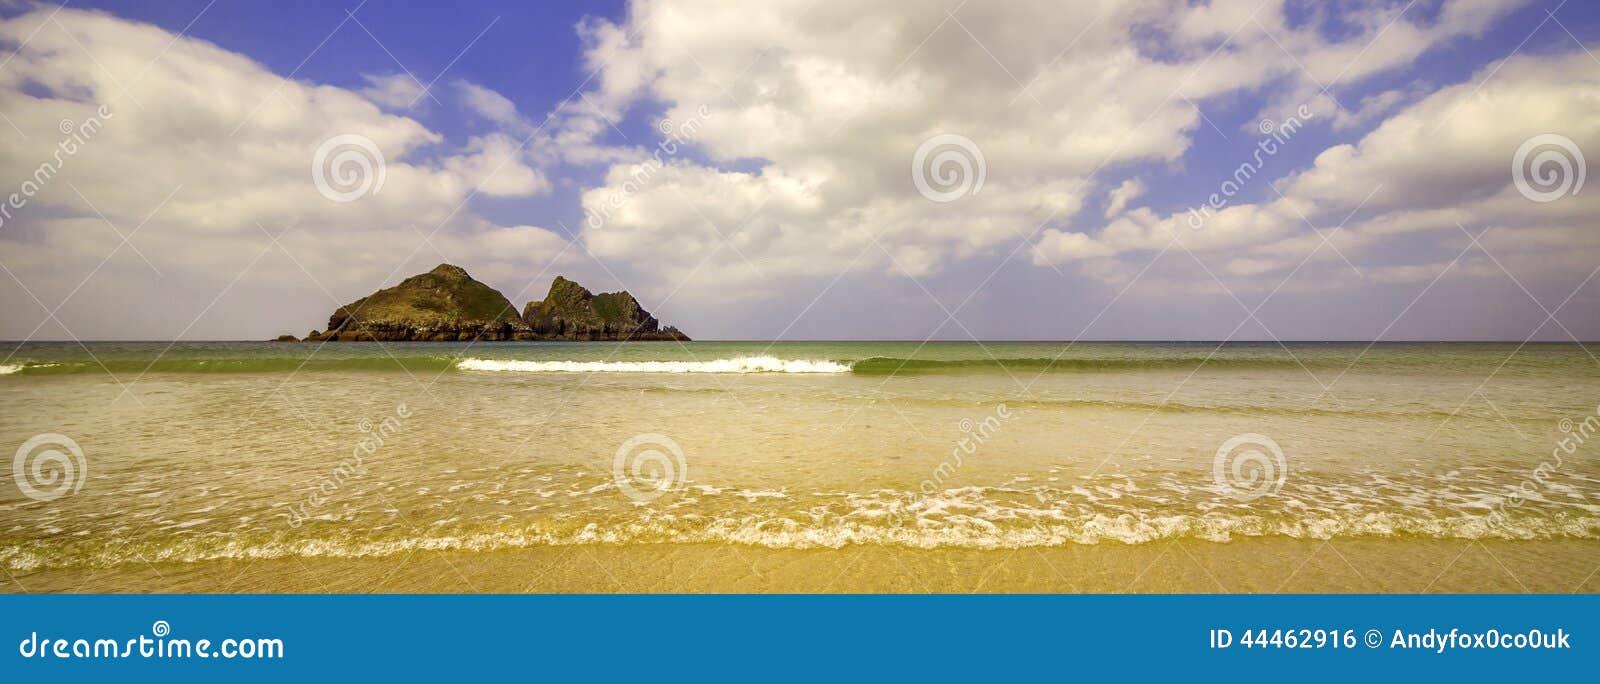 Hollywell Bay, Cornwall, England Stock Photo - Image: 44462916